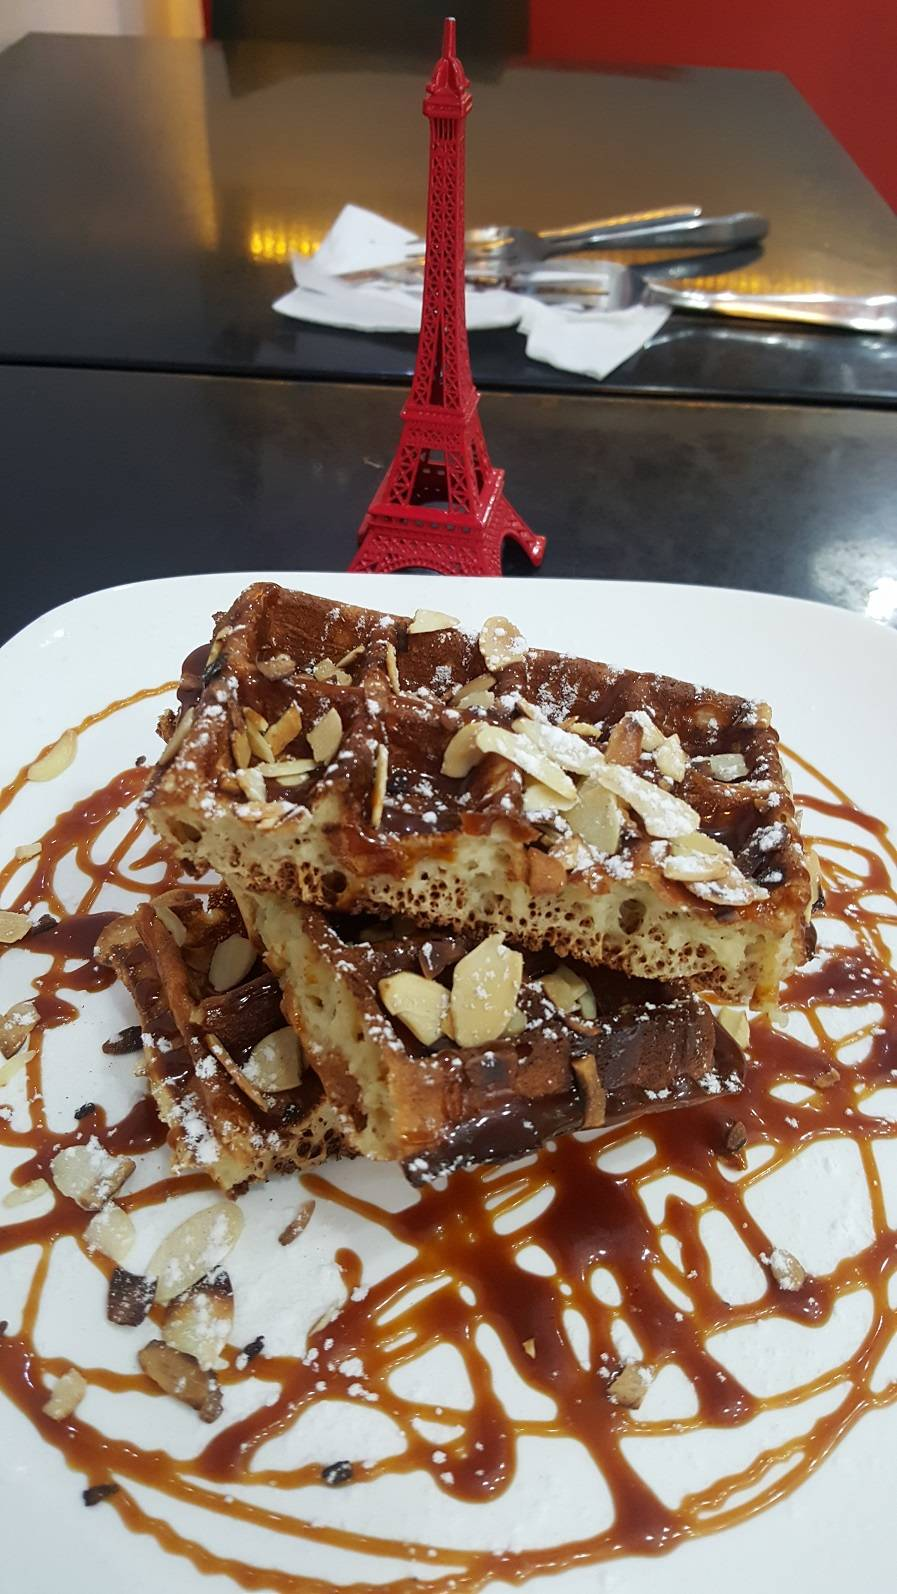 Homemade Caramel +Almond Waffle RM 15